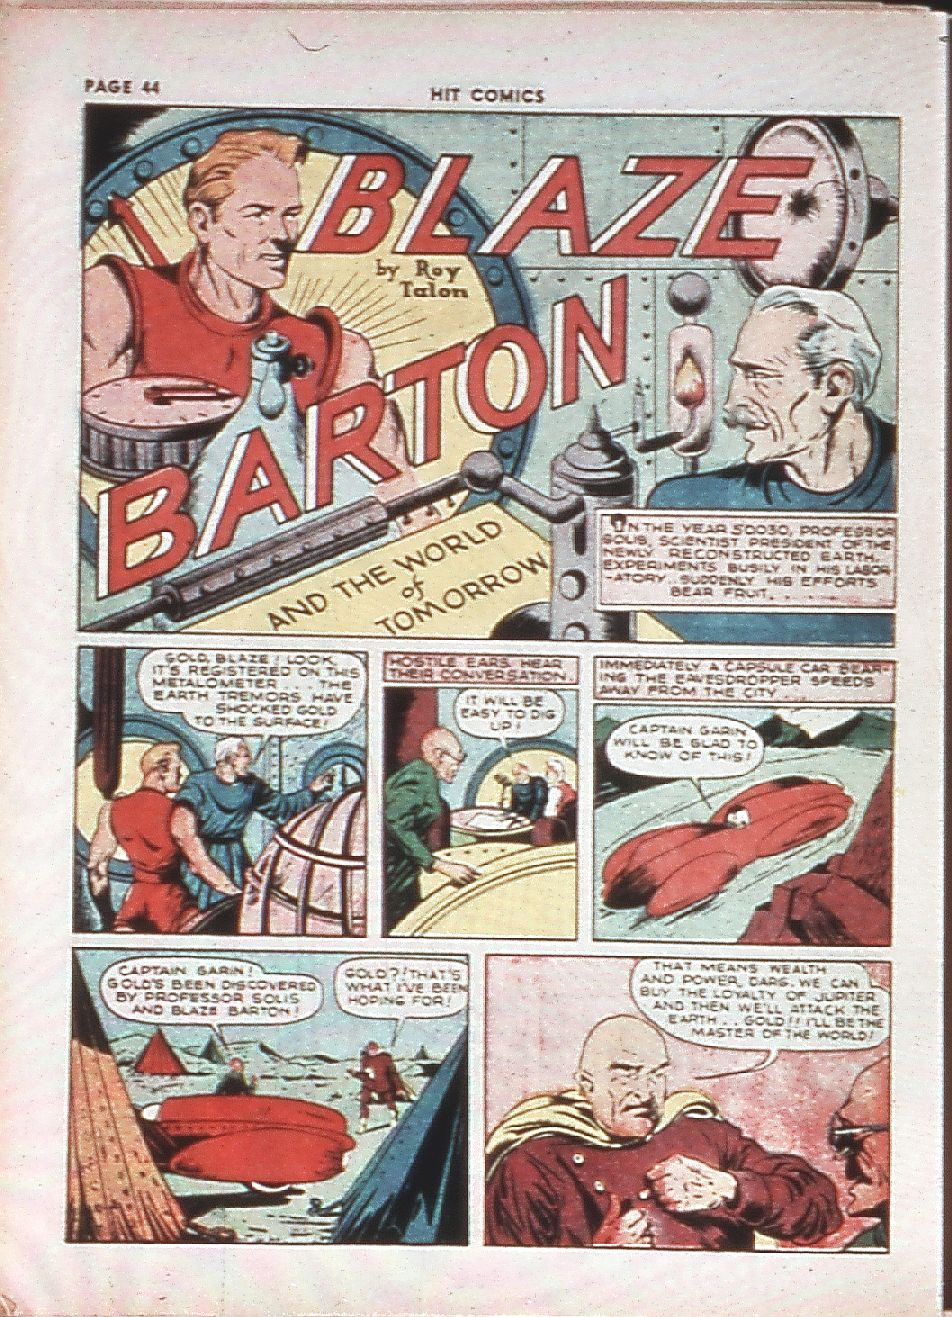 Read online Hit Comics comic -  Issue #10 - 46